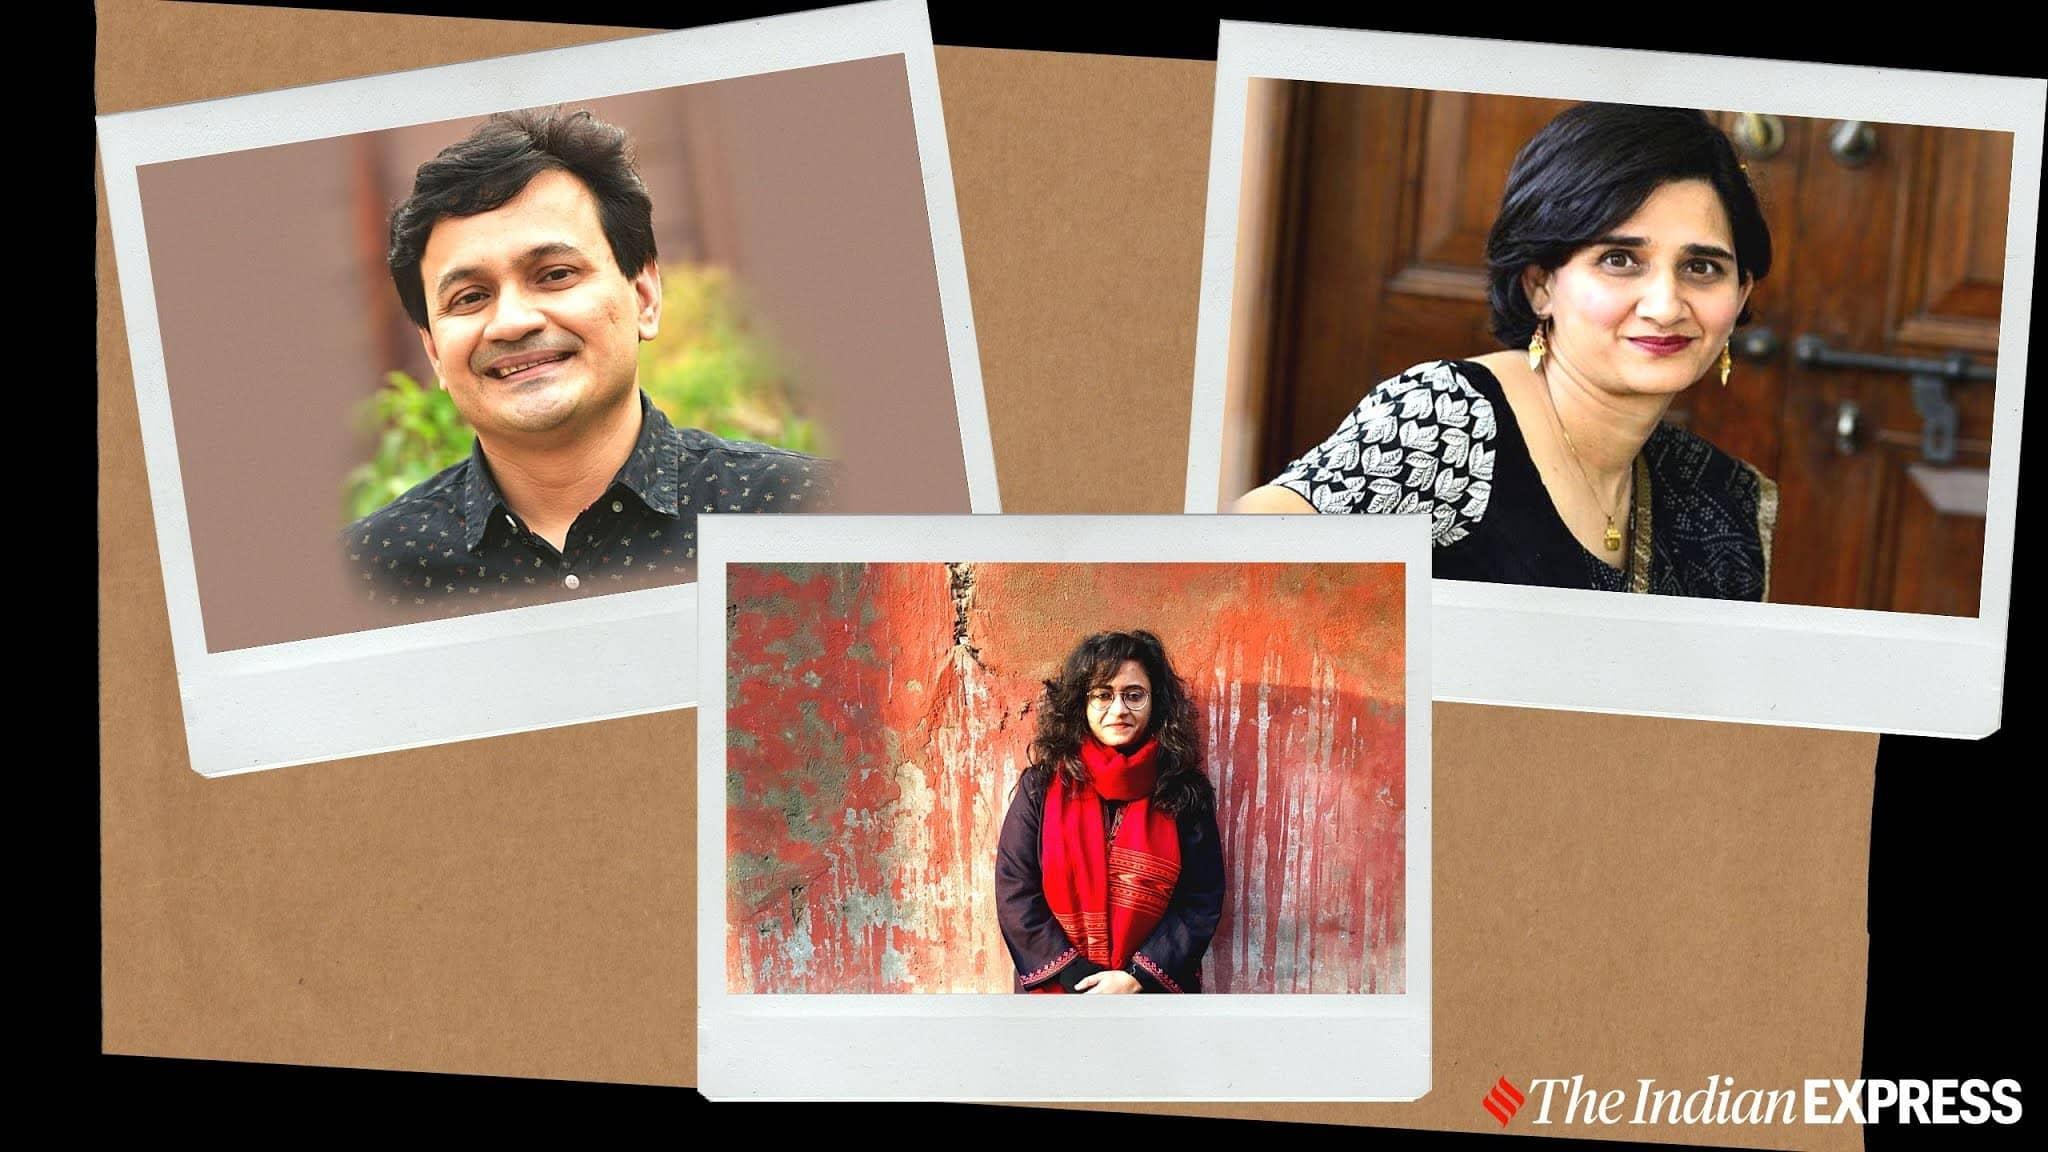 saadat hasan manto, manto, Natasha Badhwar, Saikat Majumdar and Priyanka Dubey, tributes to manto, indian express, indian express news